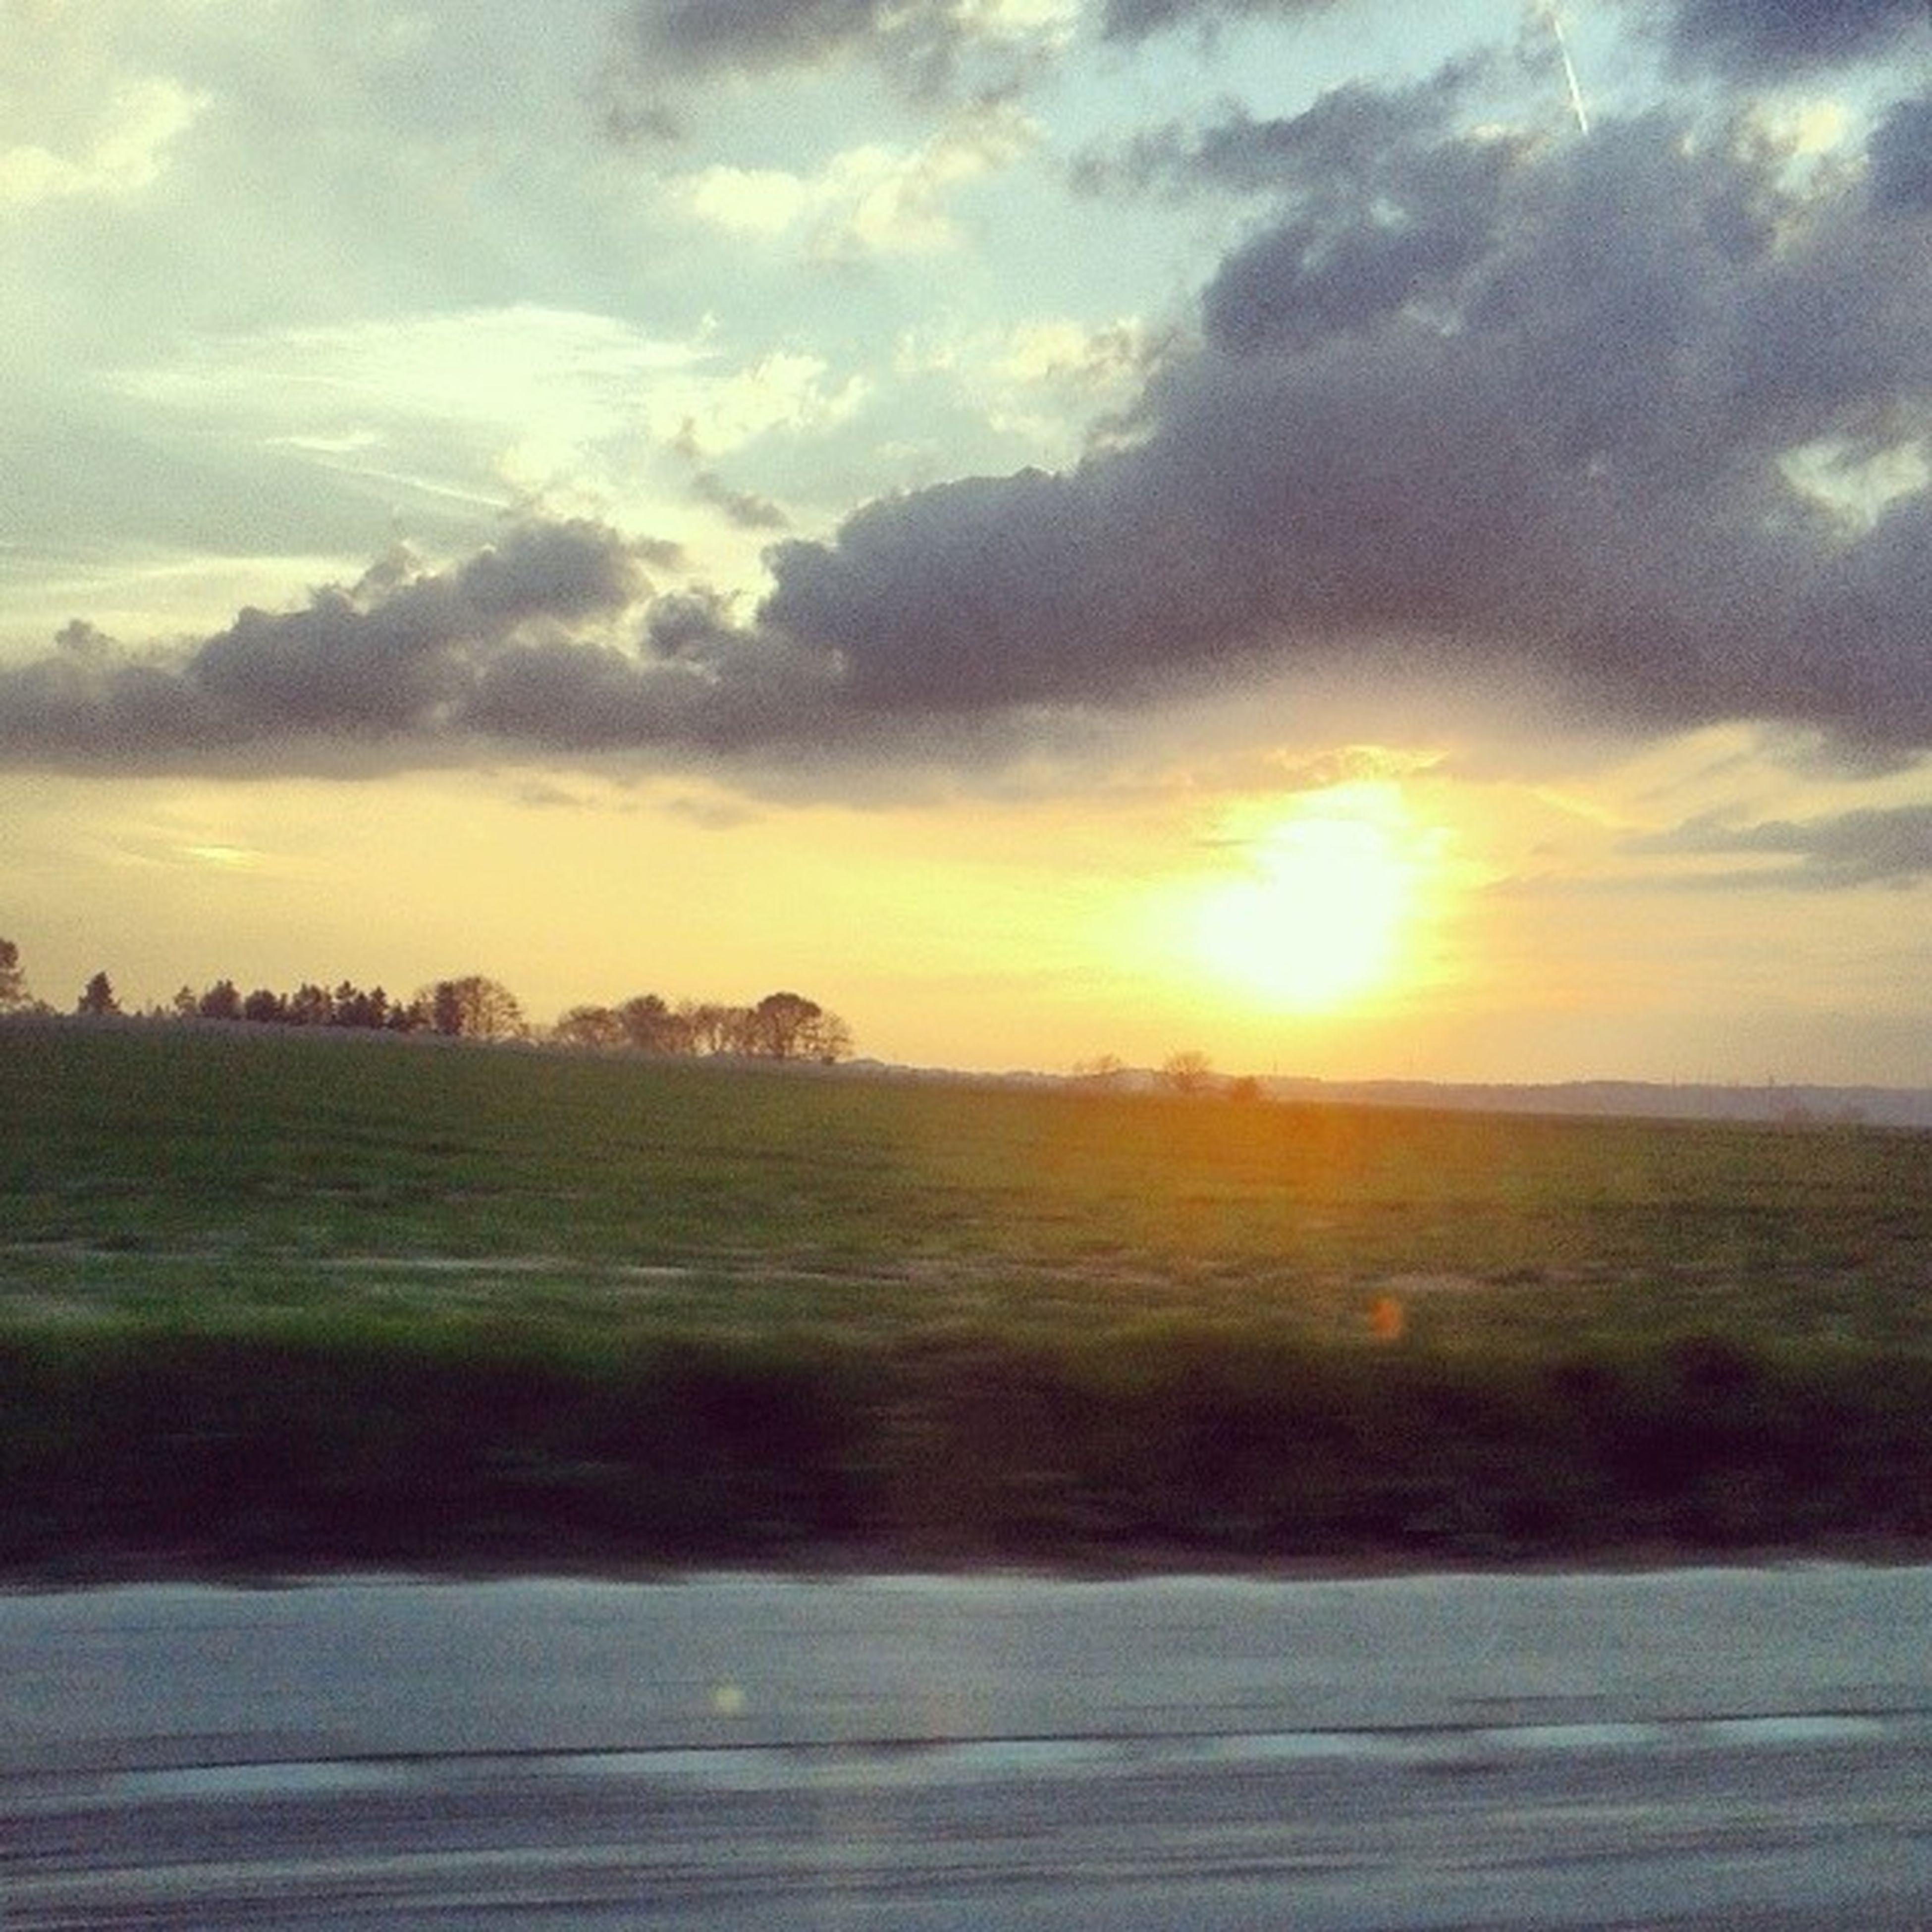 sunset, sky, cloud - sky, landscape, sun, tranquil scene, scenics, field, tranquility, beauty in nature, nature, cloudy, cloud, sunlight, sunbeam, idyllic, grass, rural scene, horizon over land, outdoors